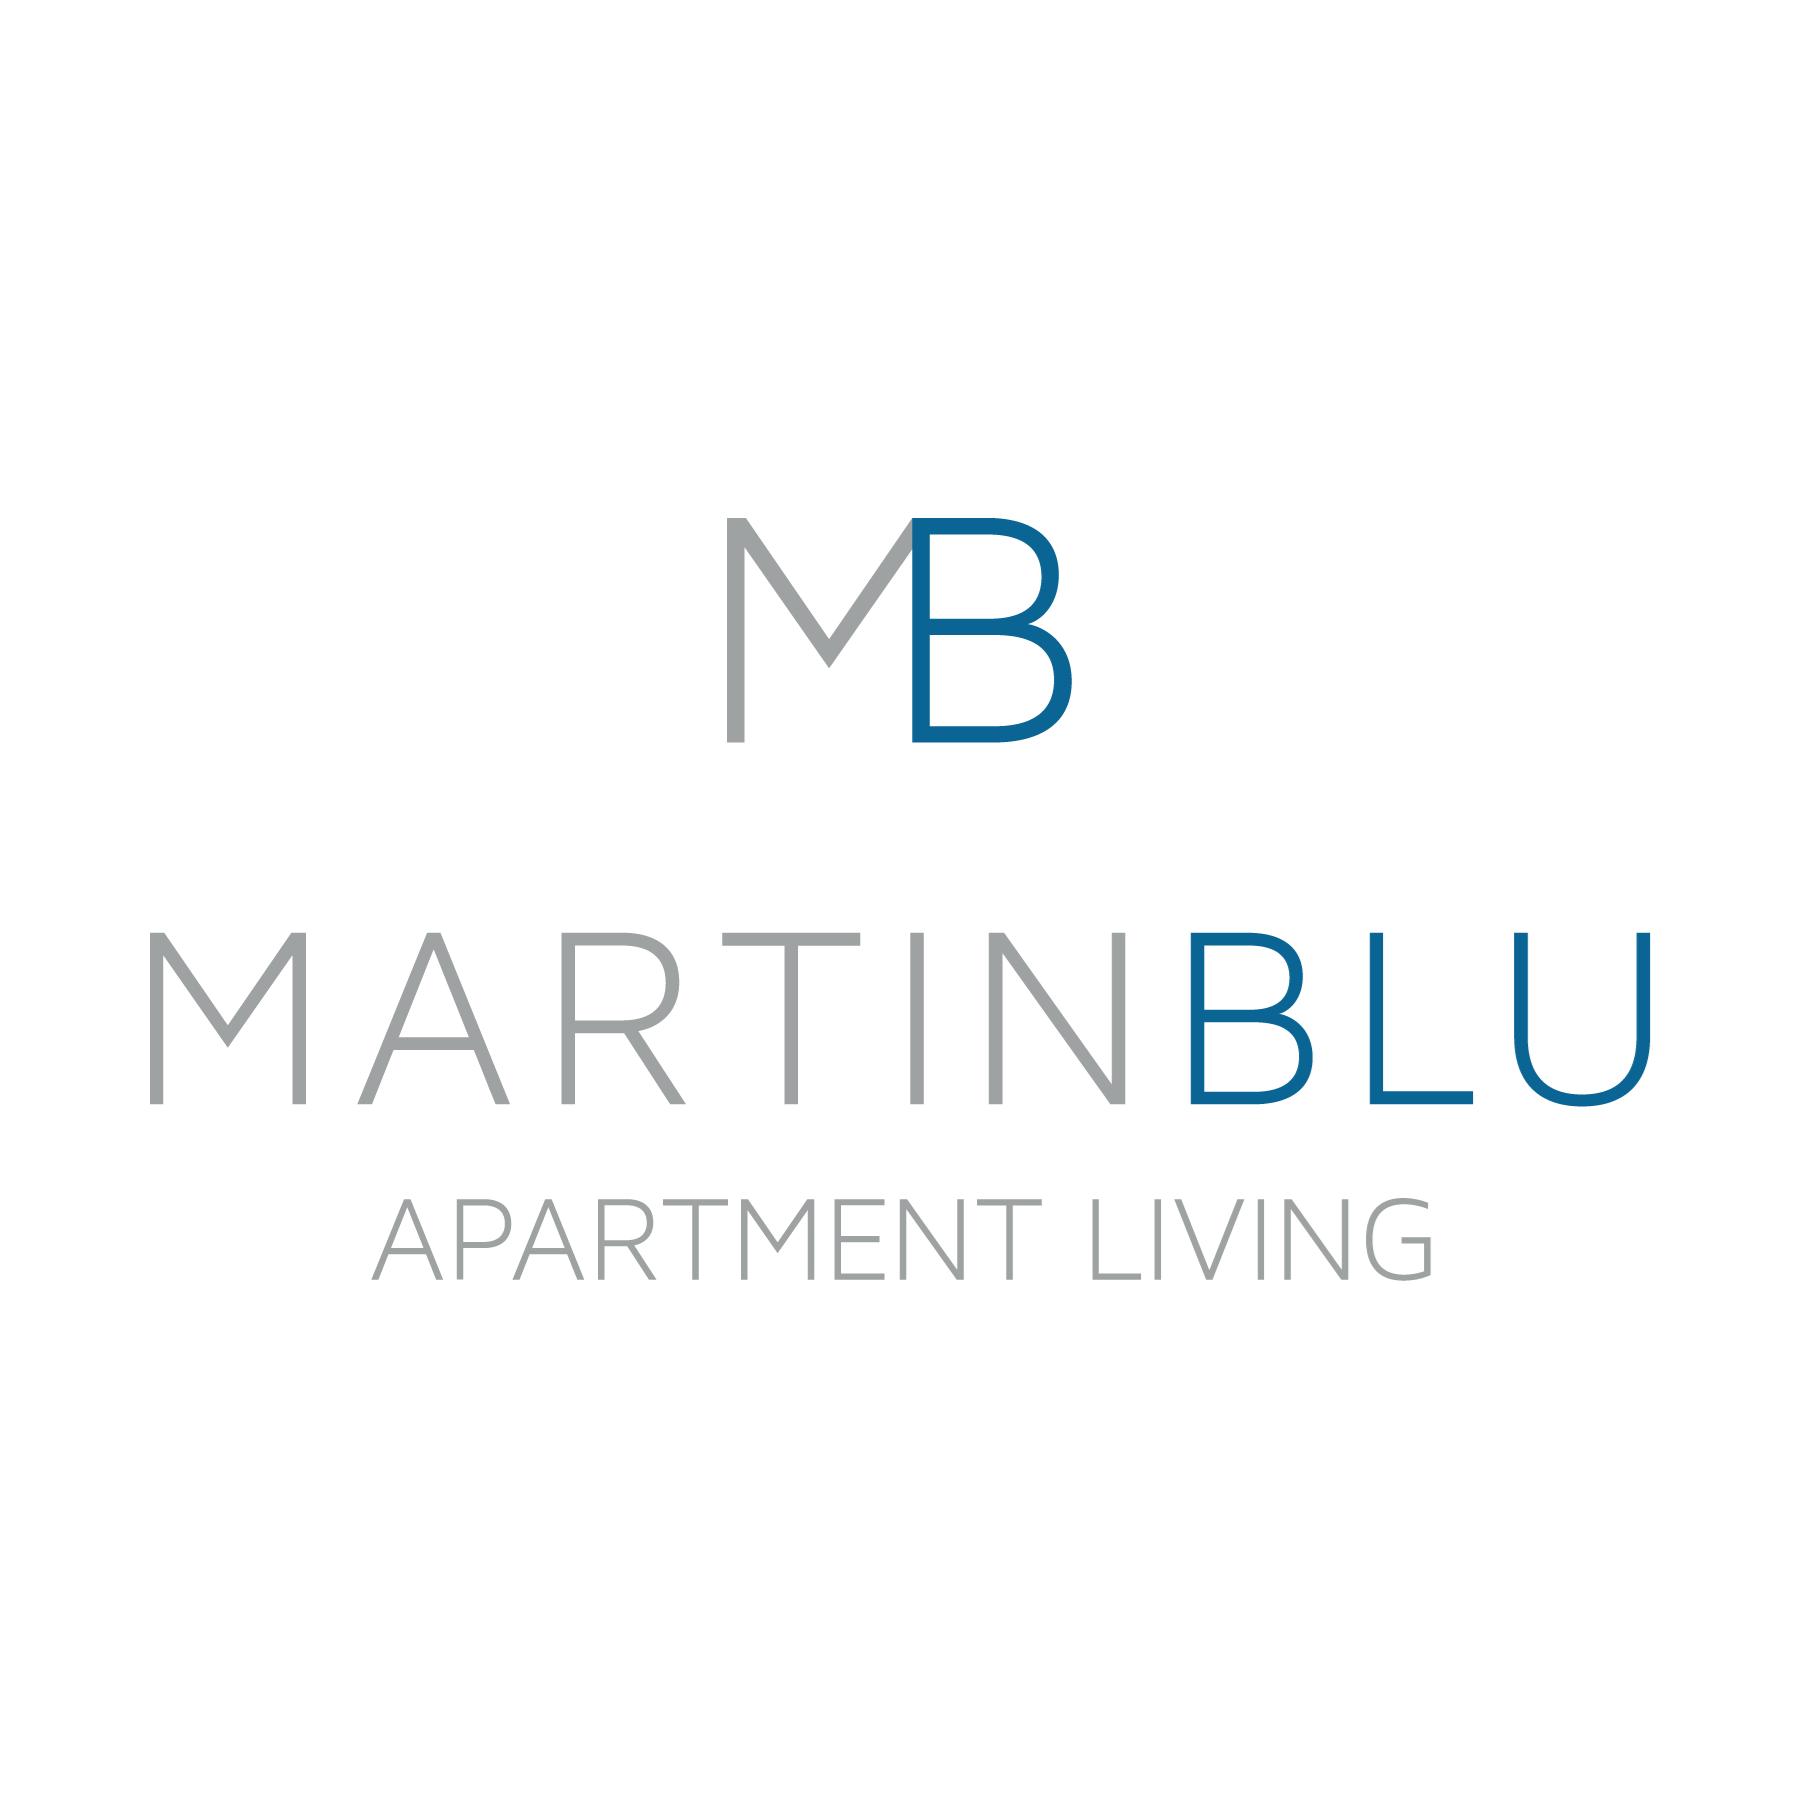 Martin Blu